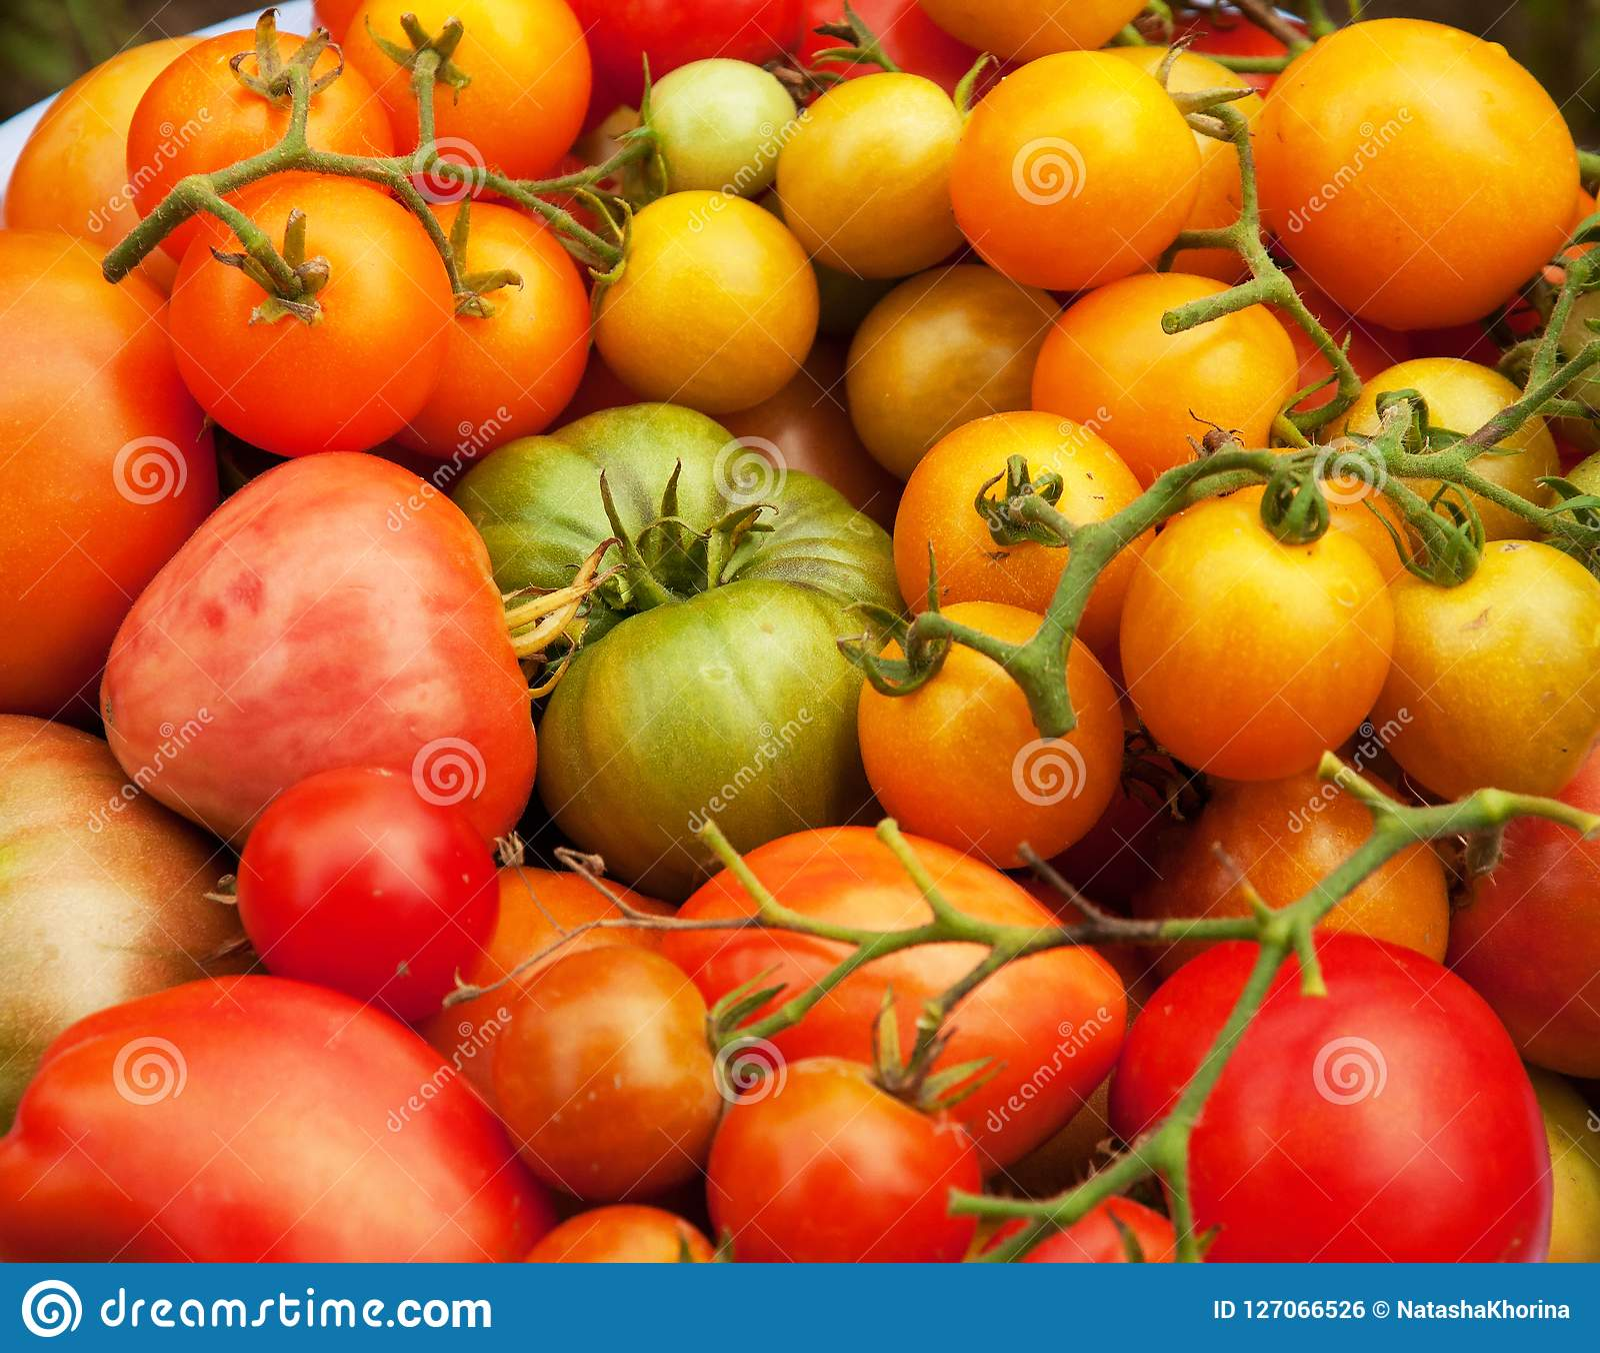 Harvest Tomatoes Vegetables Autumn Garden Plants Fall Stock Photo